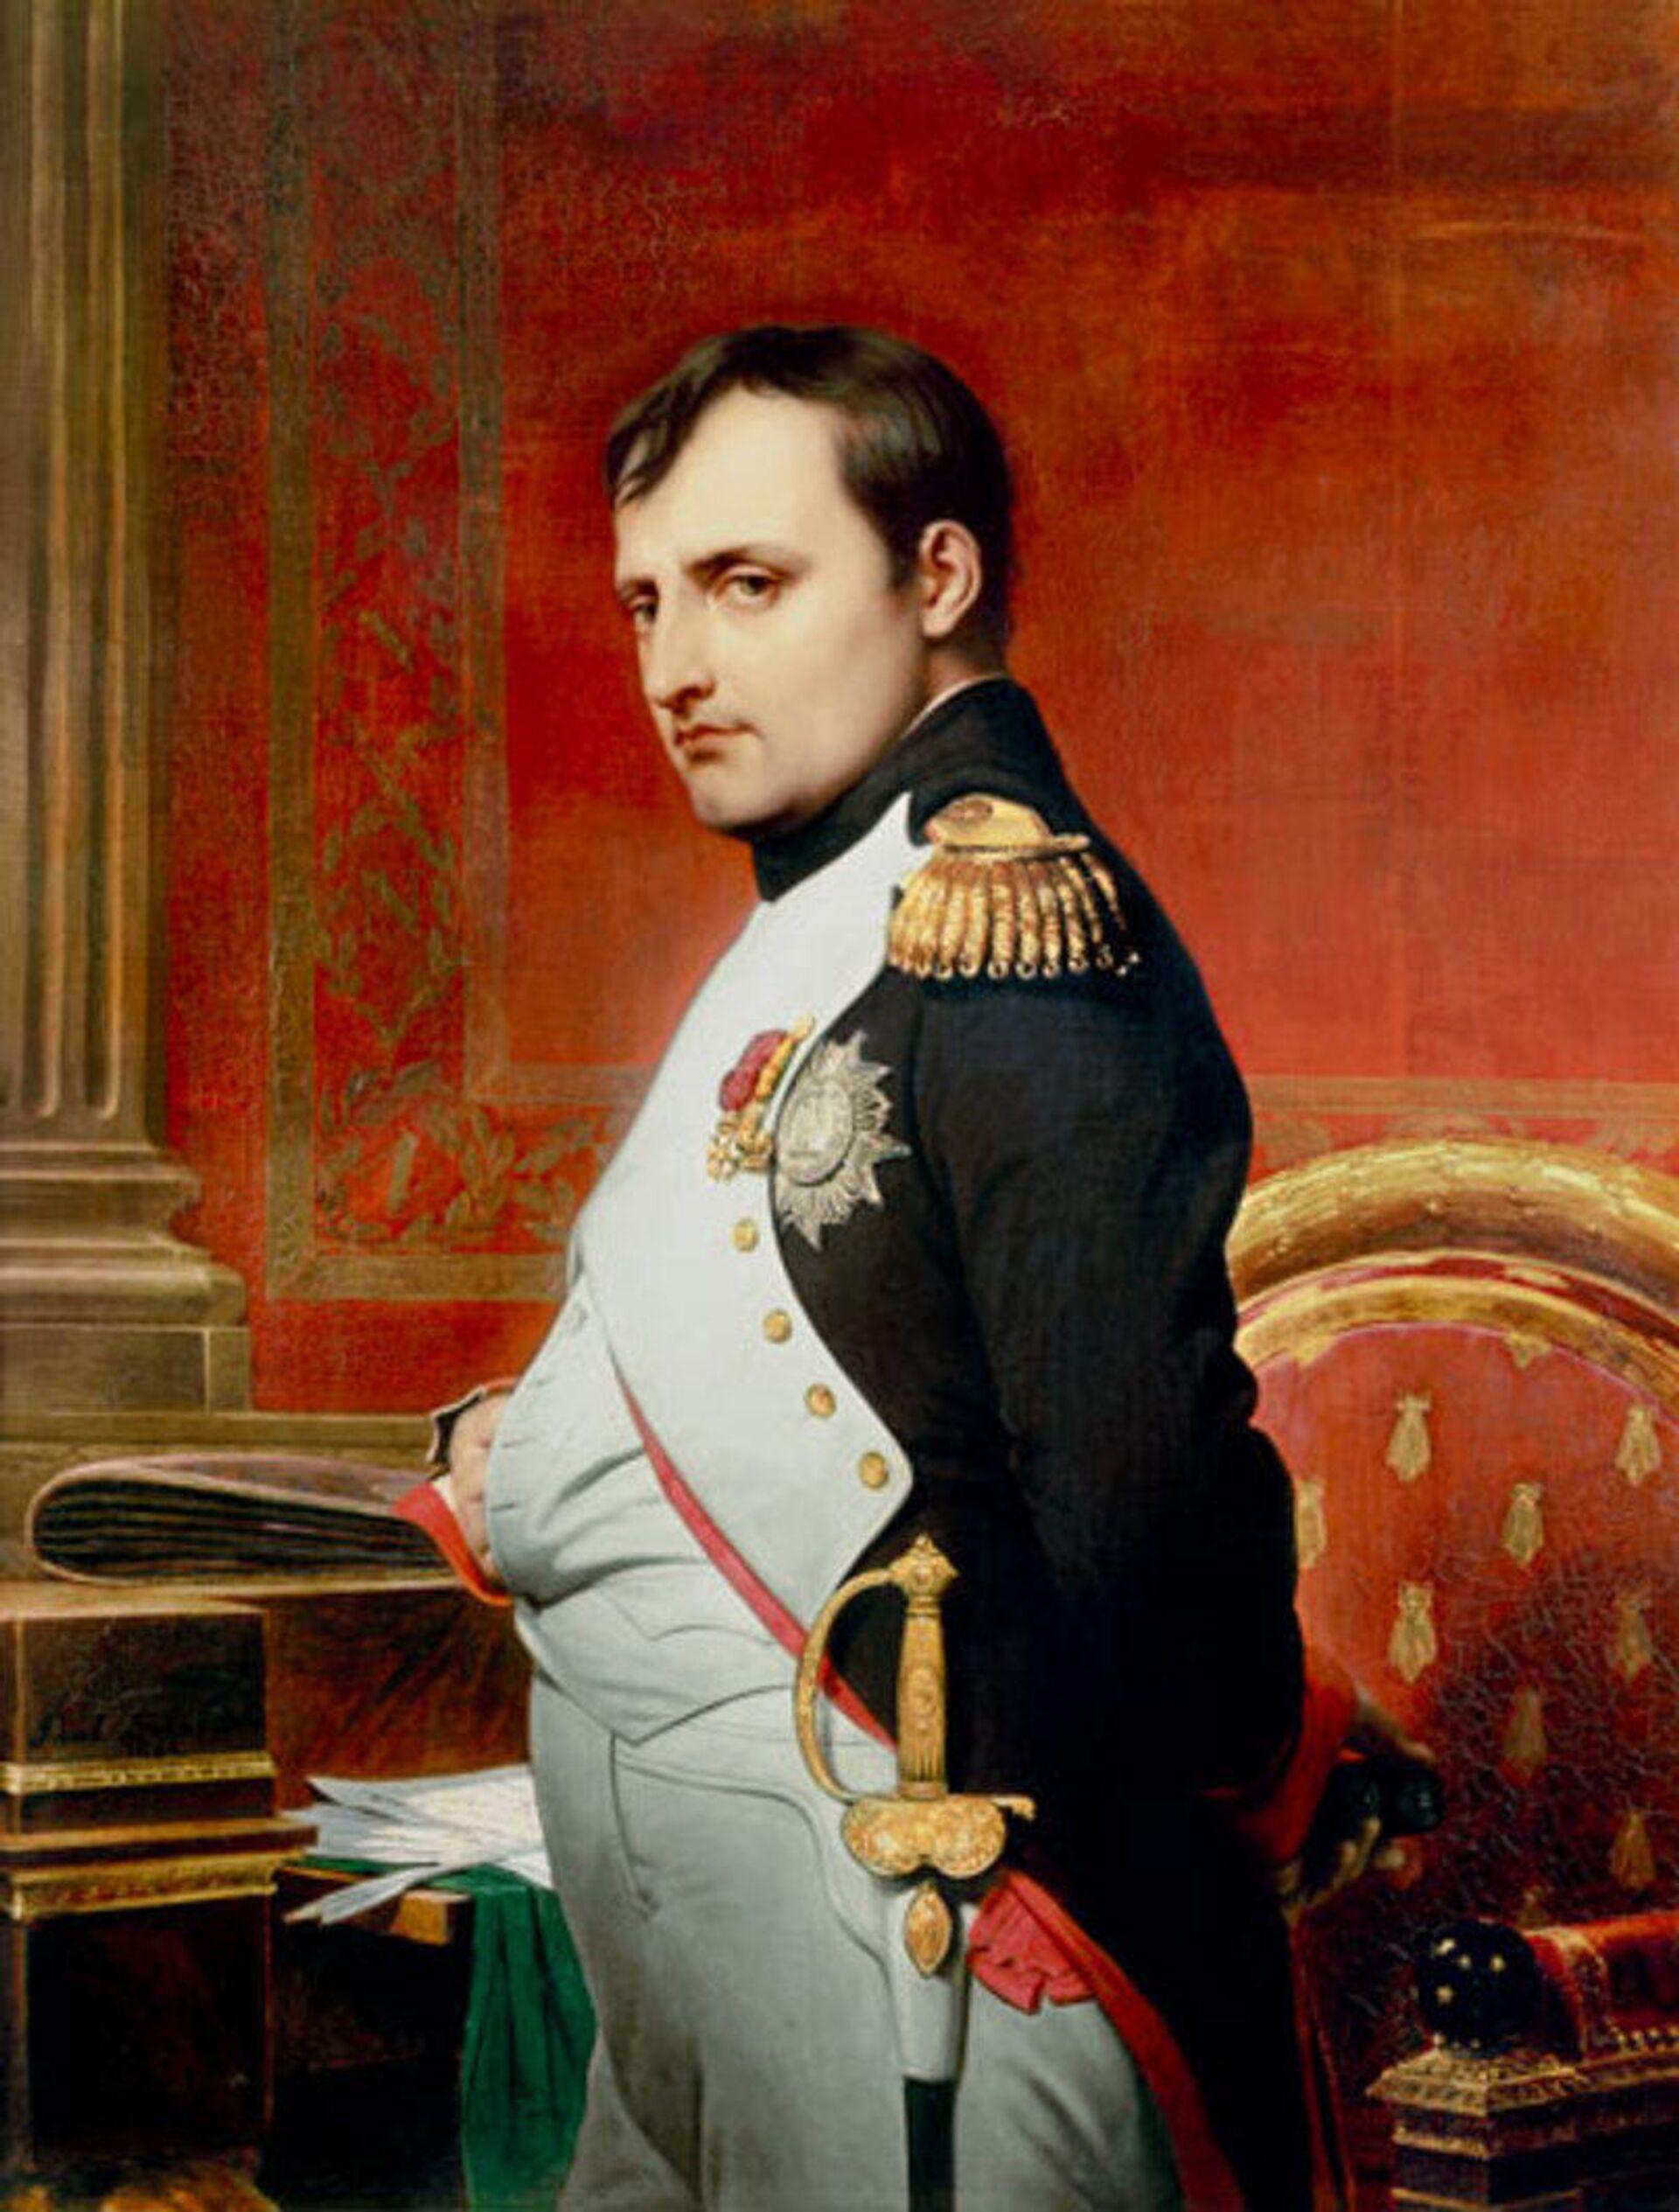 Наполеон I Бонапарт, портрет кисти Поля Делароша (1807) - РИА Новости, 1920, 16.10.2020